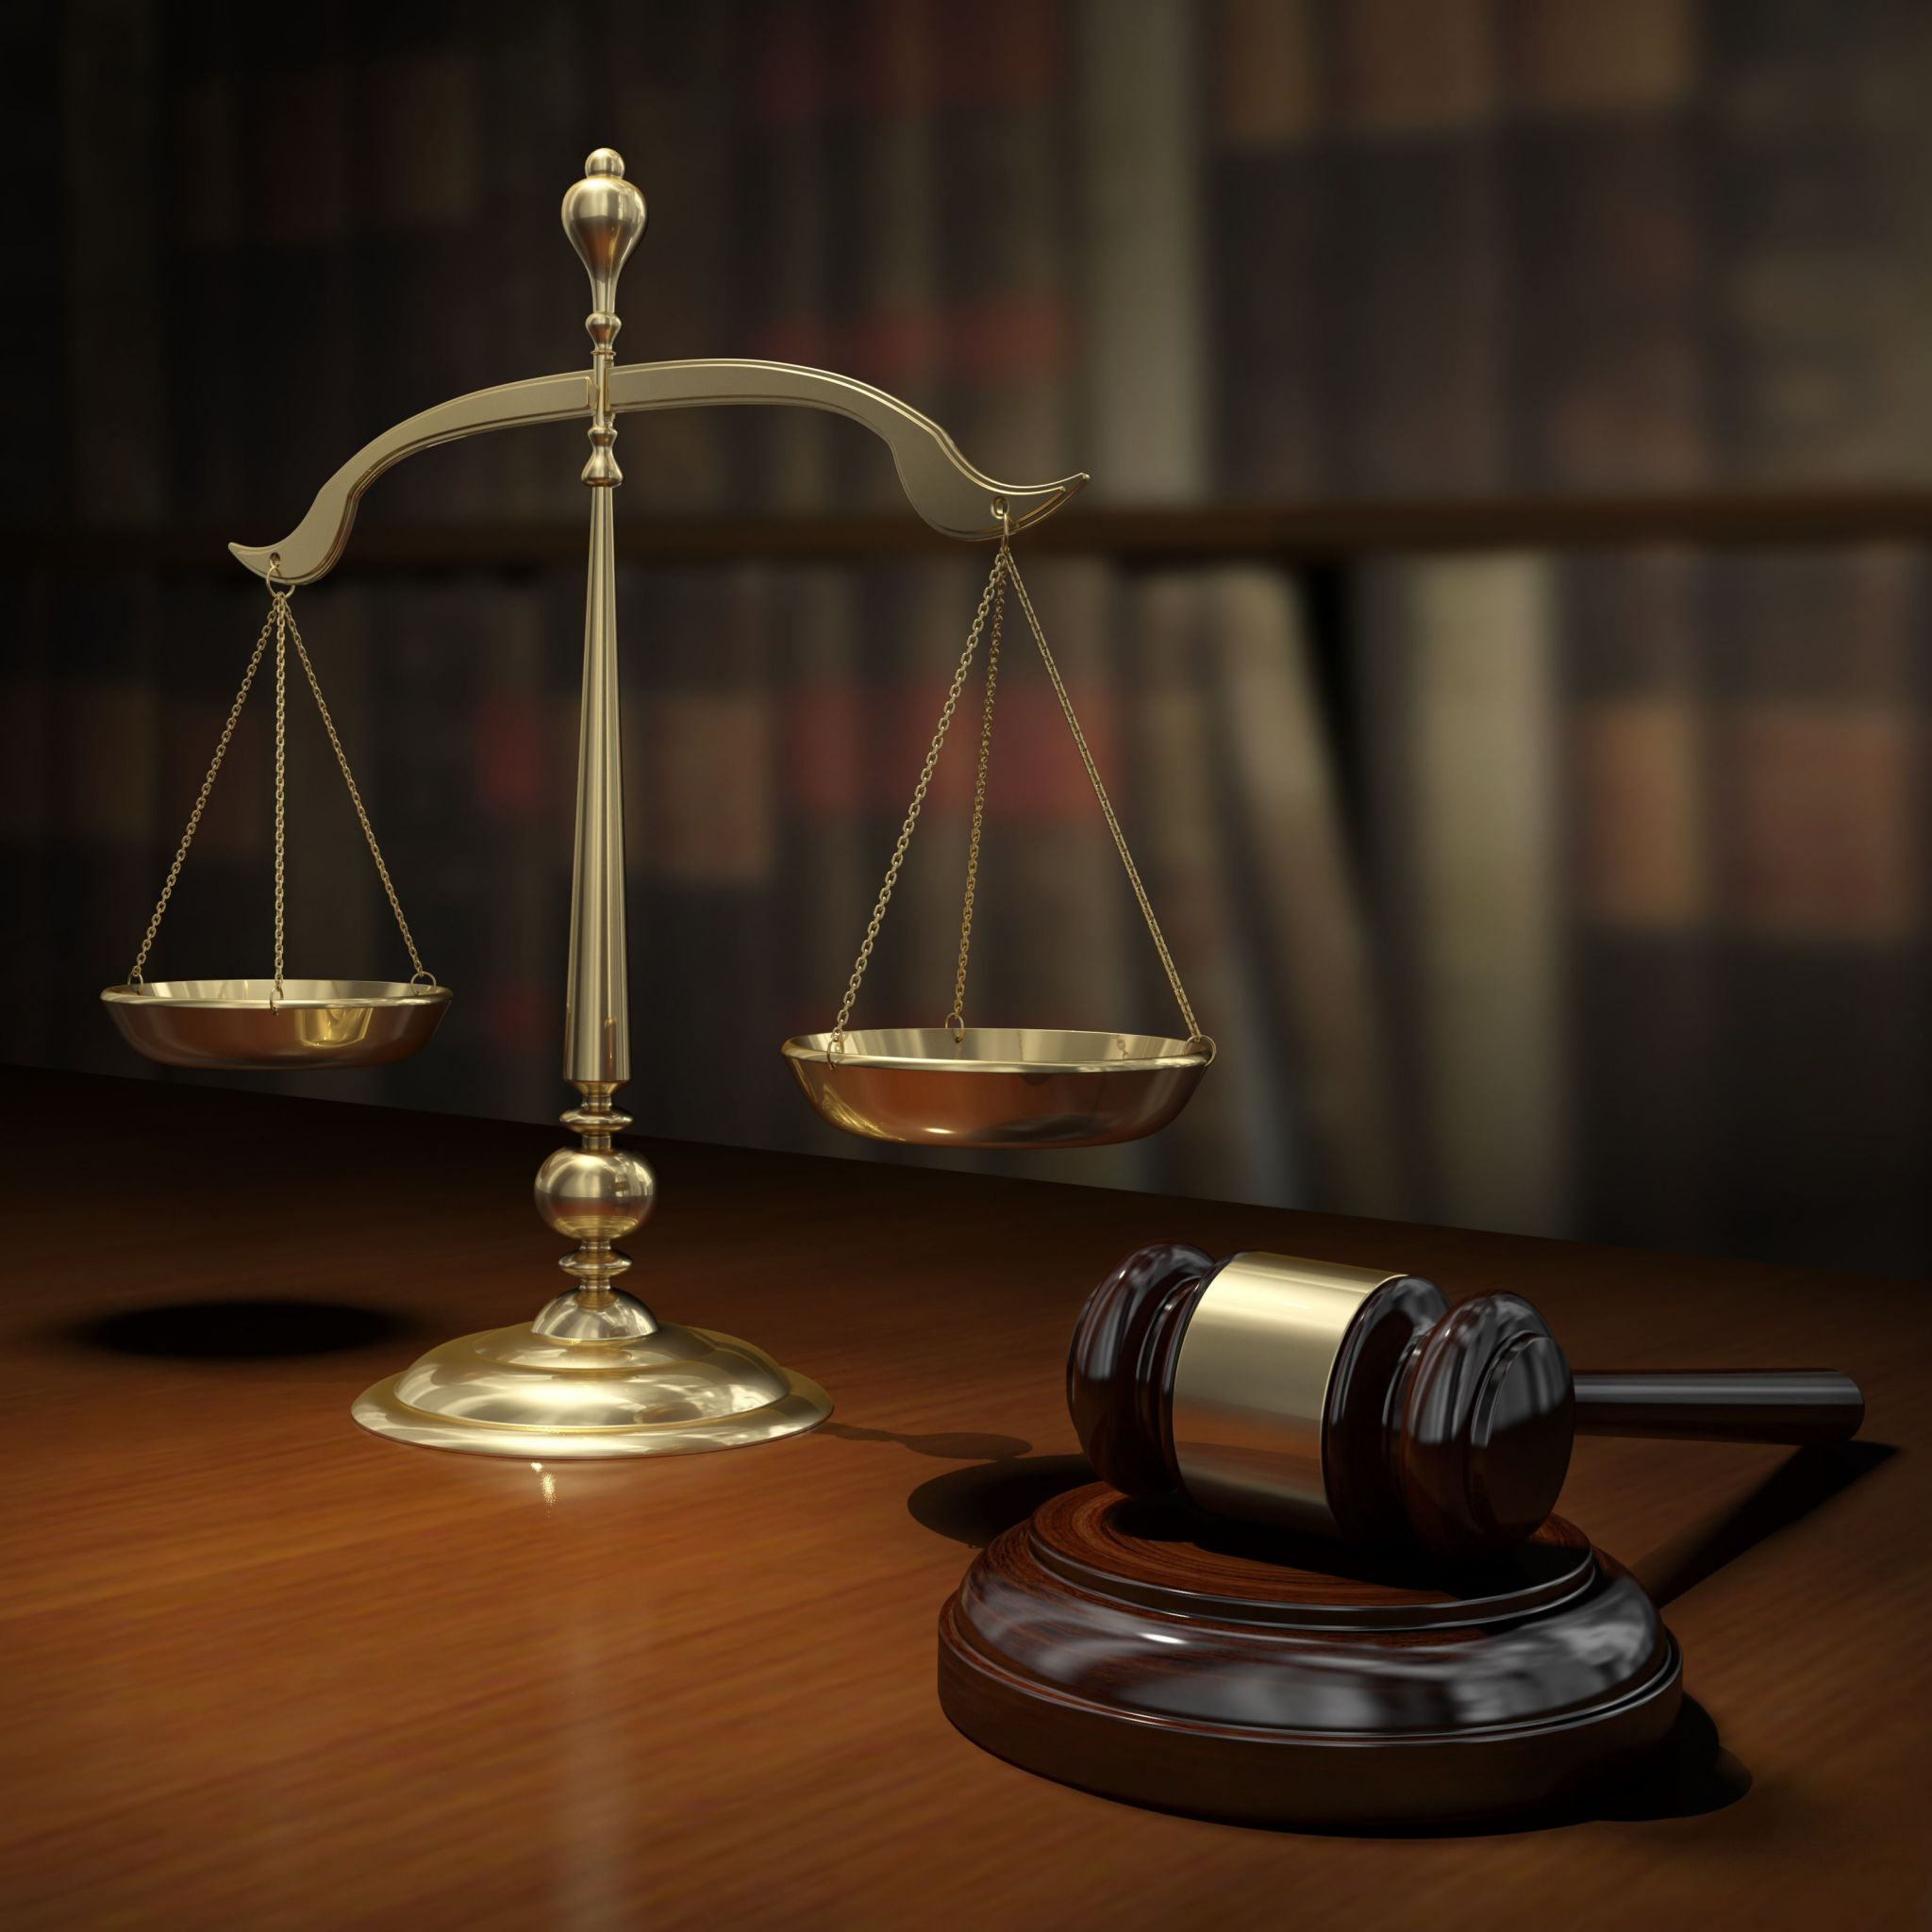 avukat vekalet ücreti 2020